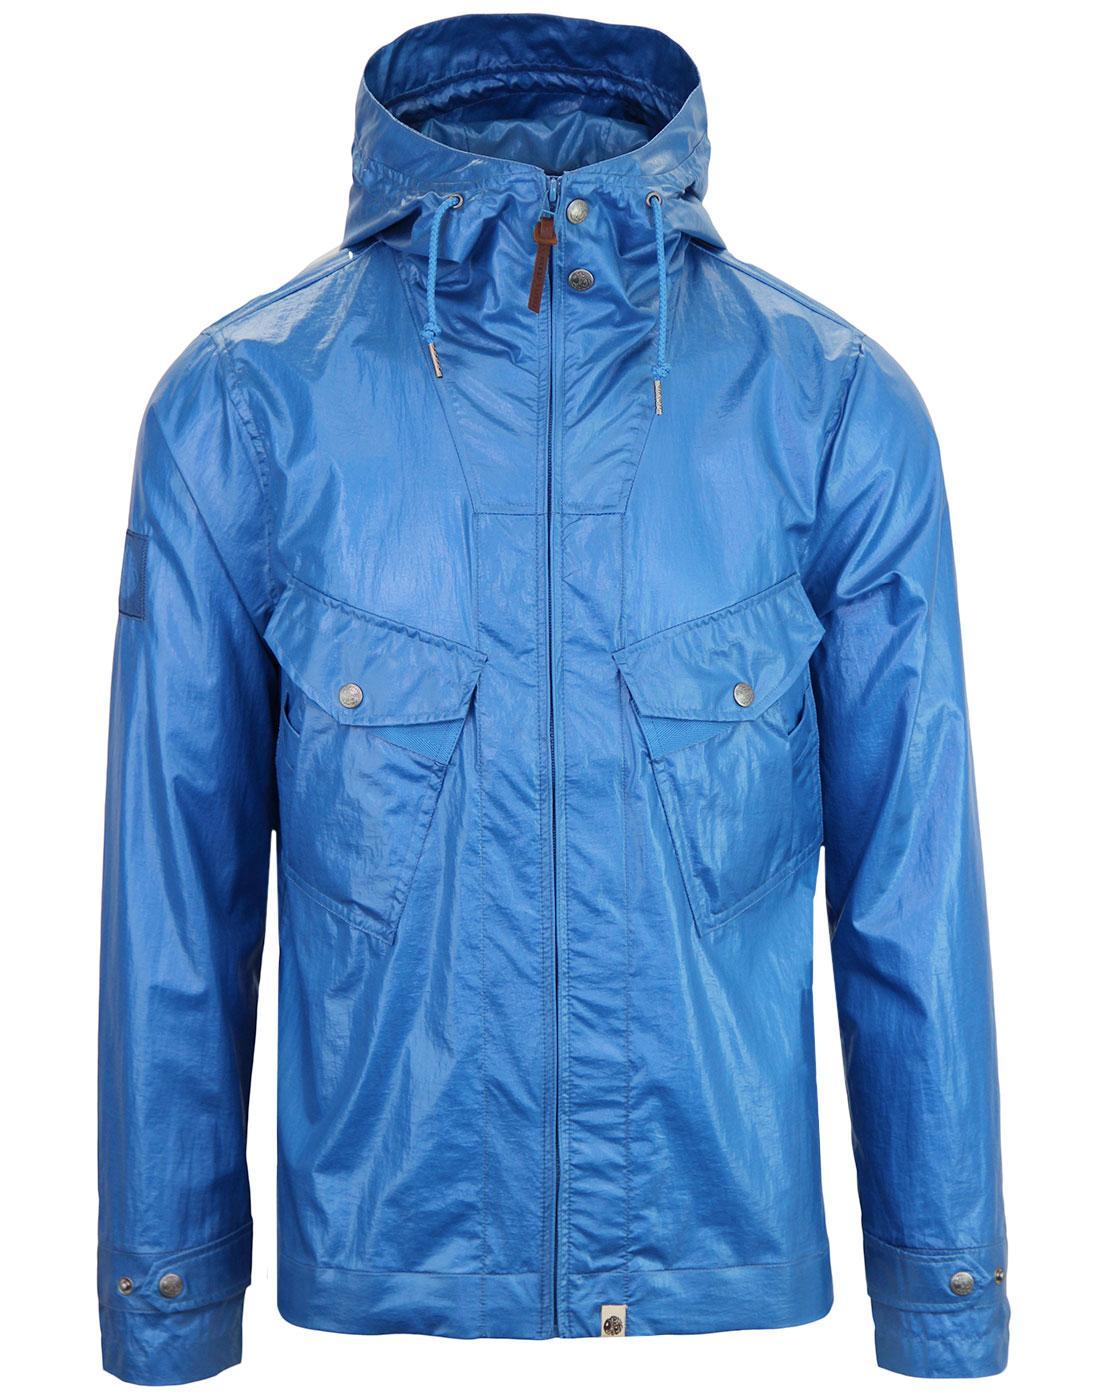 Teredo PRETTY GREEN Retro Wet Look Hooded Jacket B